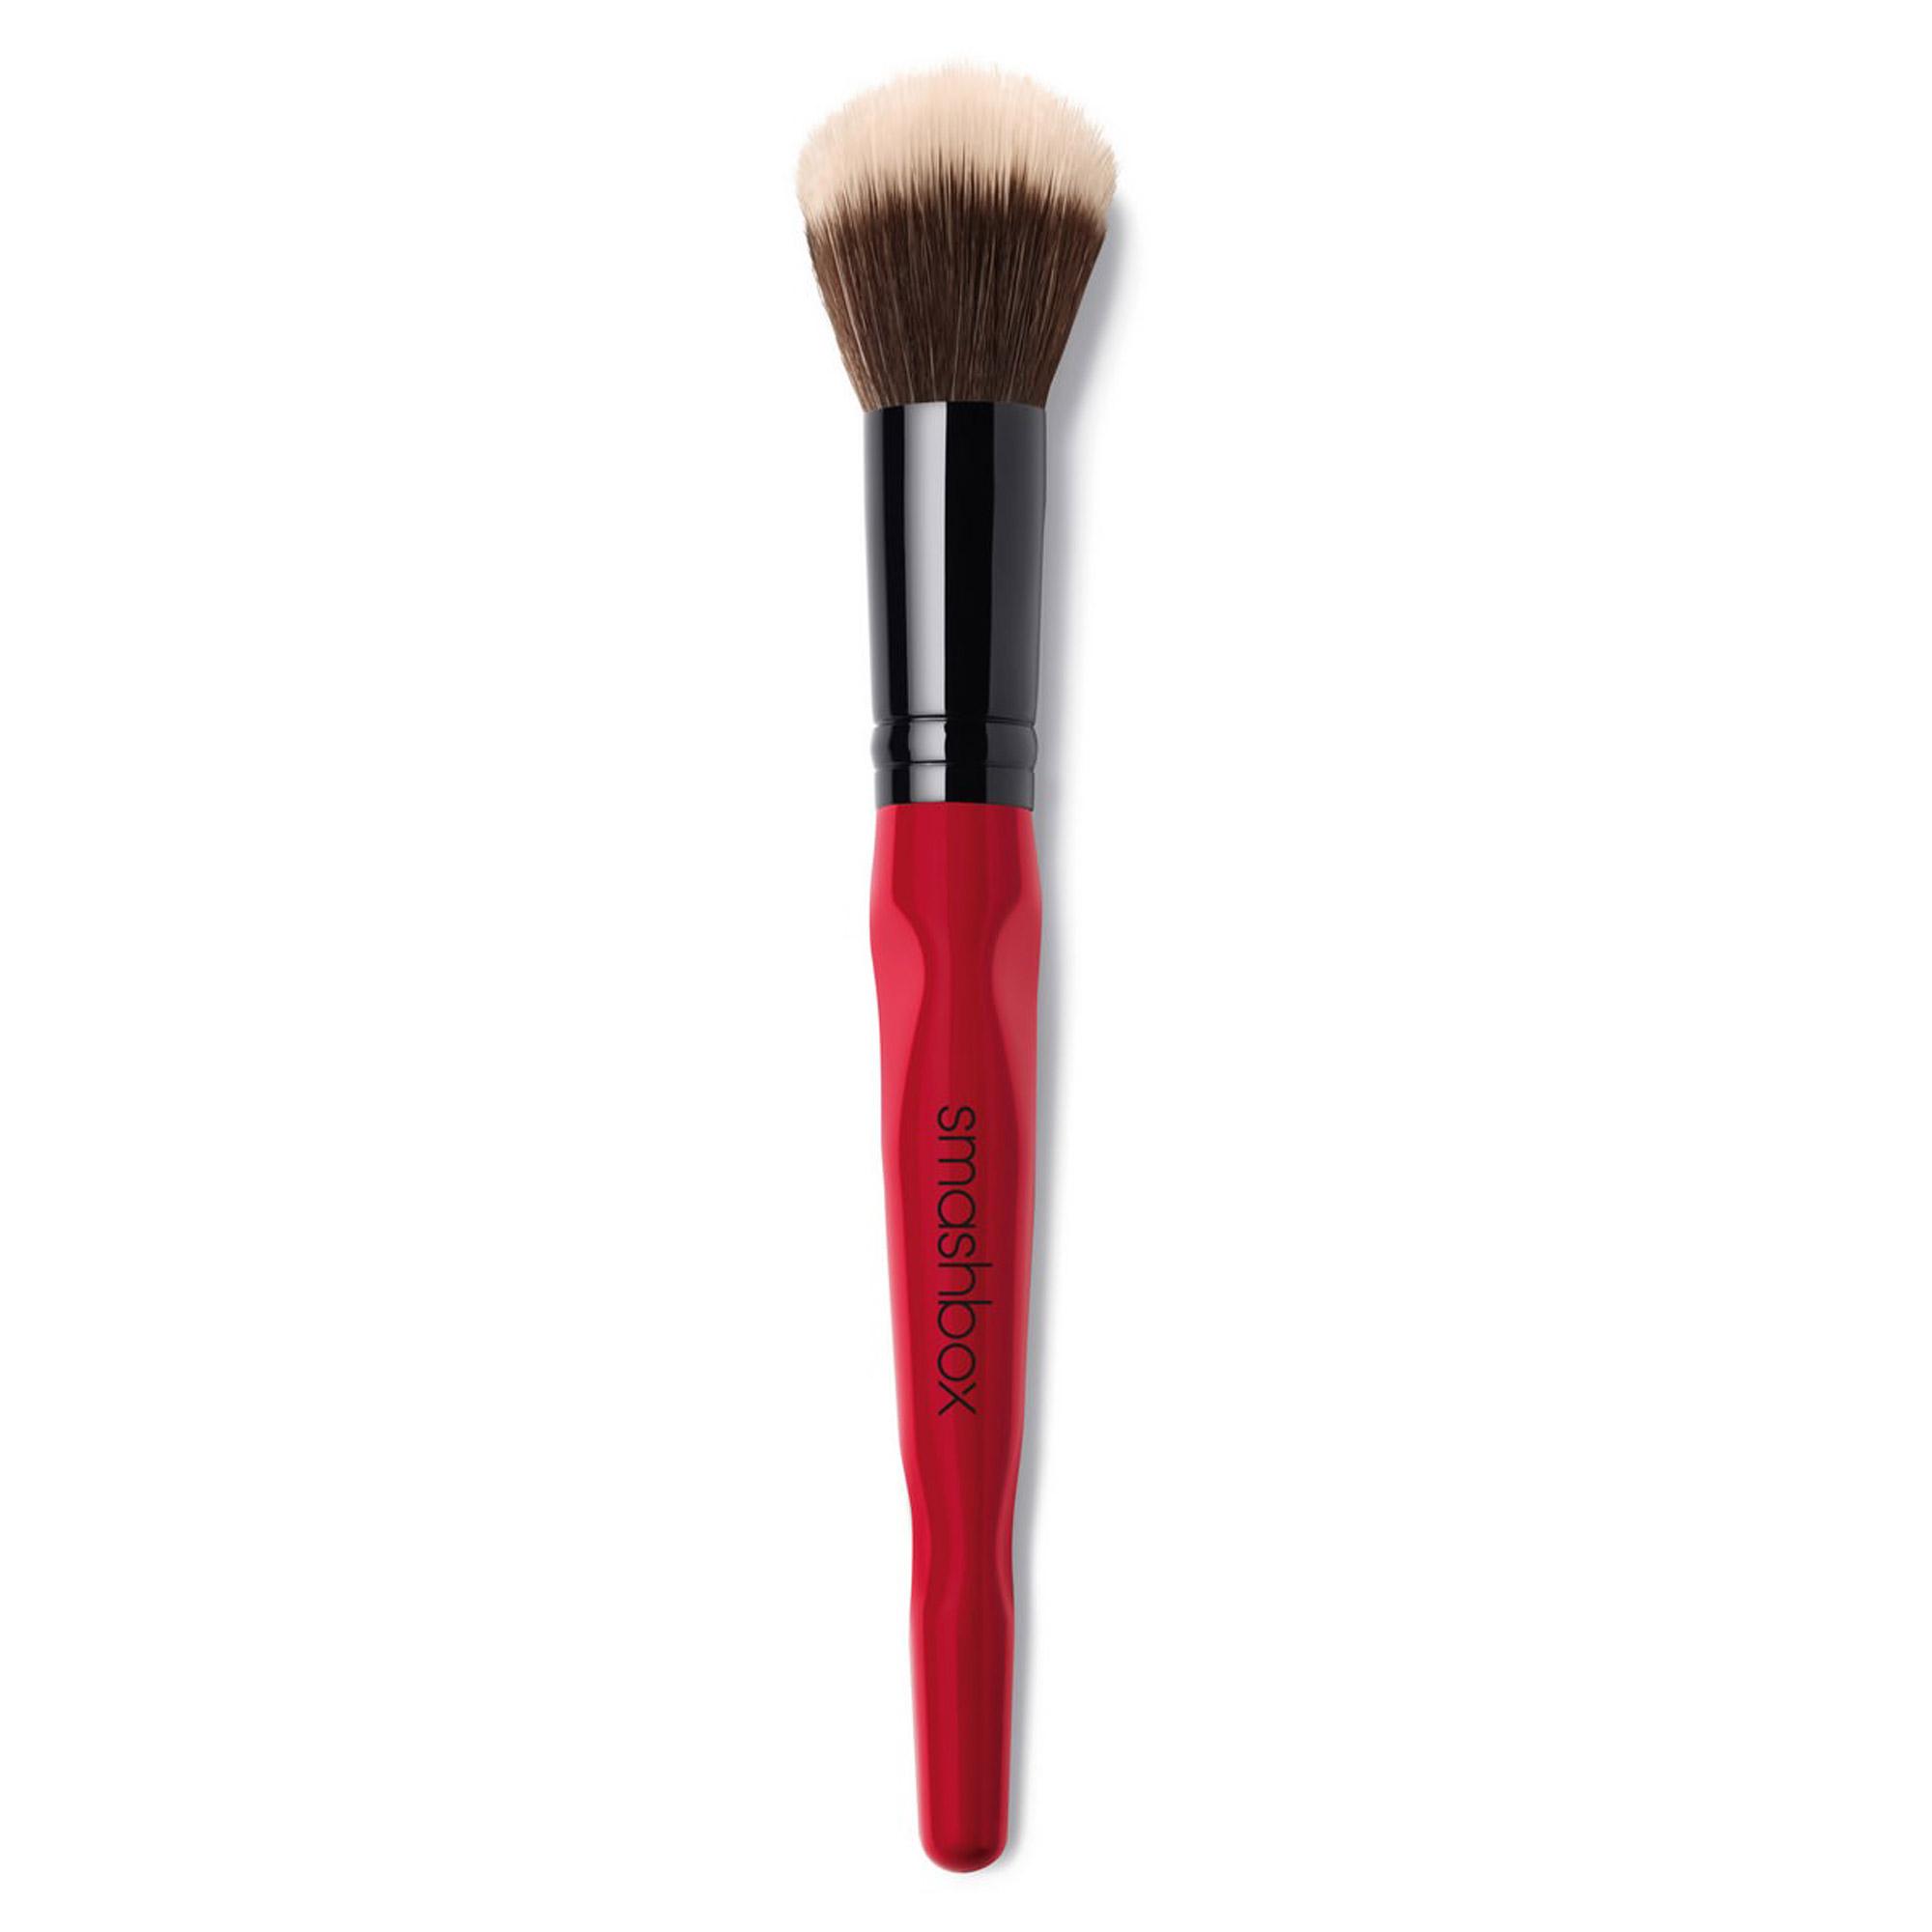 Stippling foundation Brush